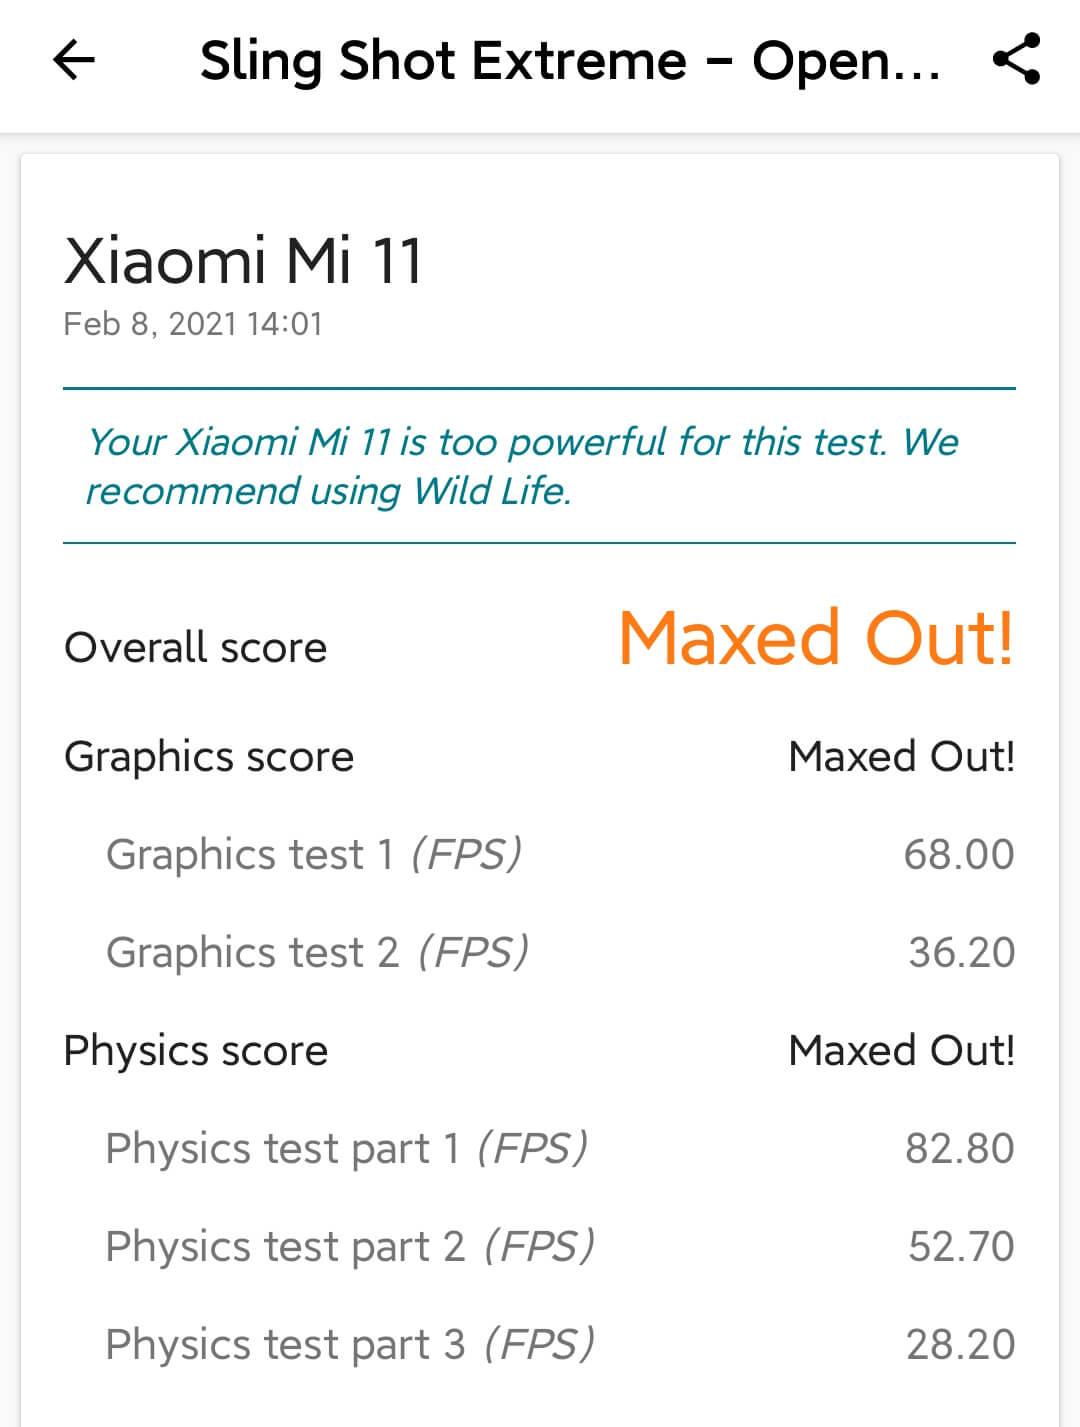 Xiaomi Mi 11は3Dマークのグラフィックスコア68fps